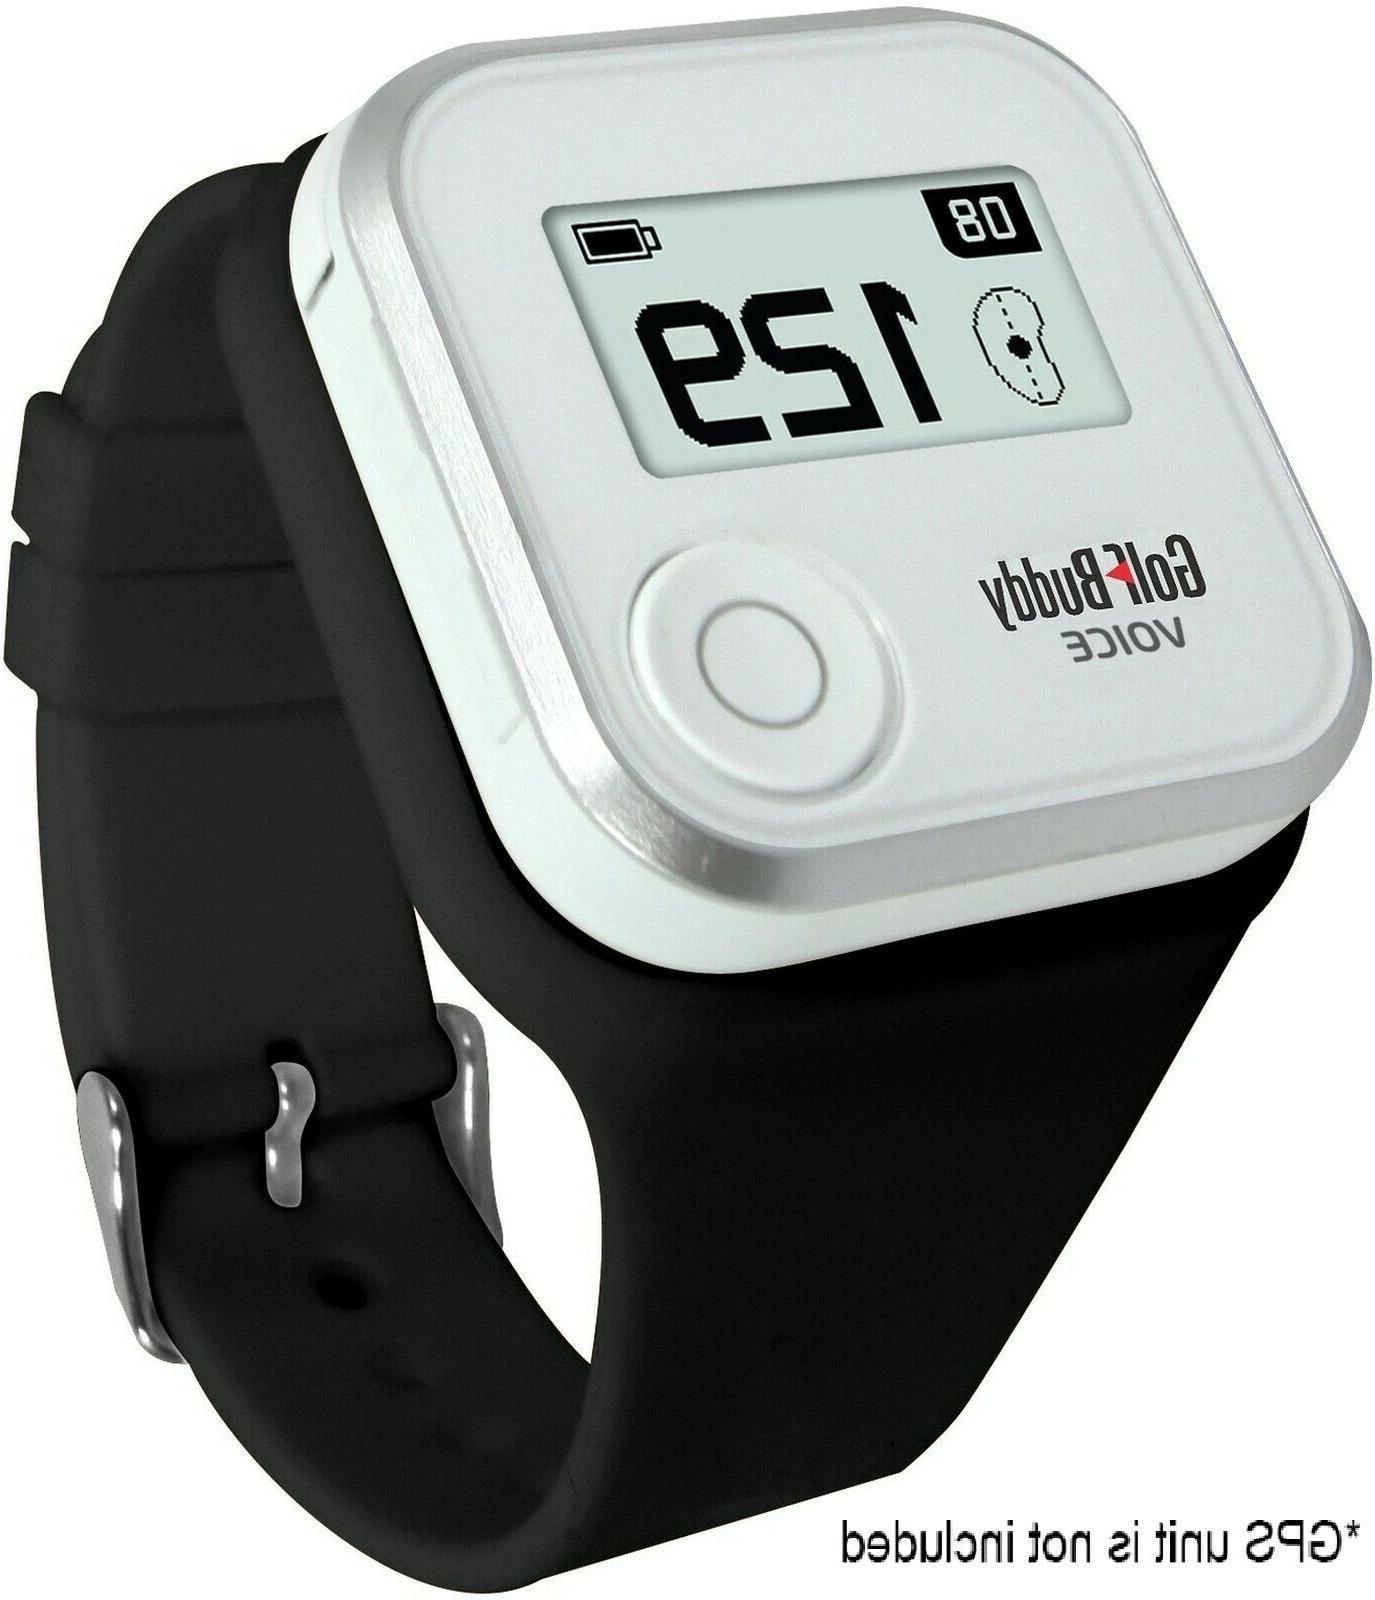 Wrist Golf Buddy GPS 2 Accessory Silicon